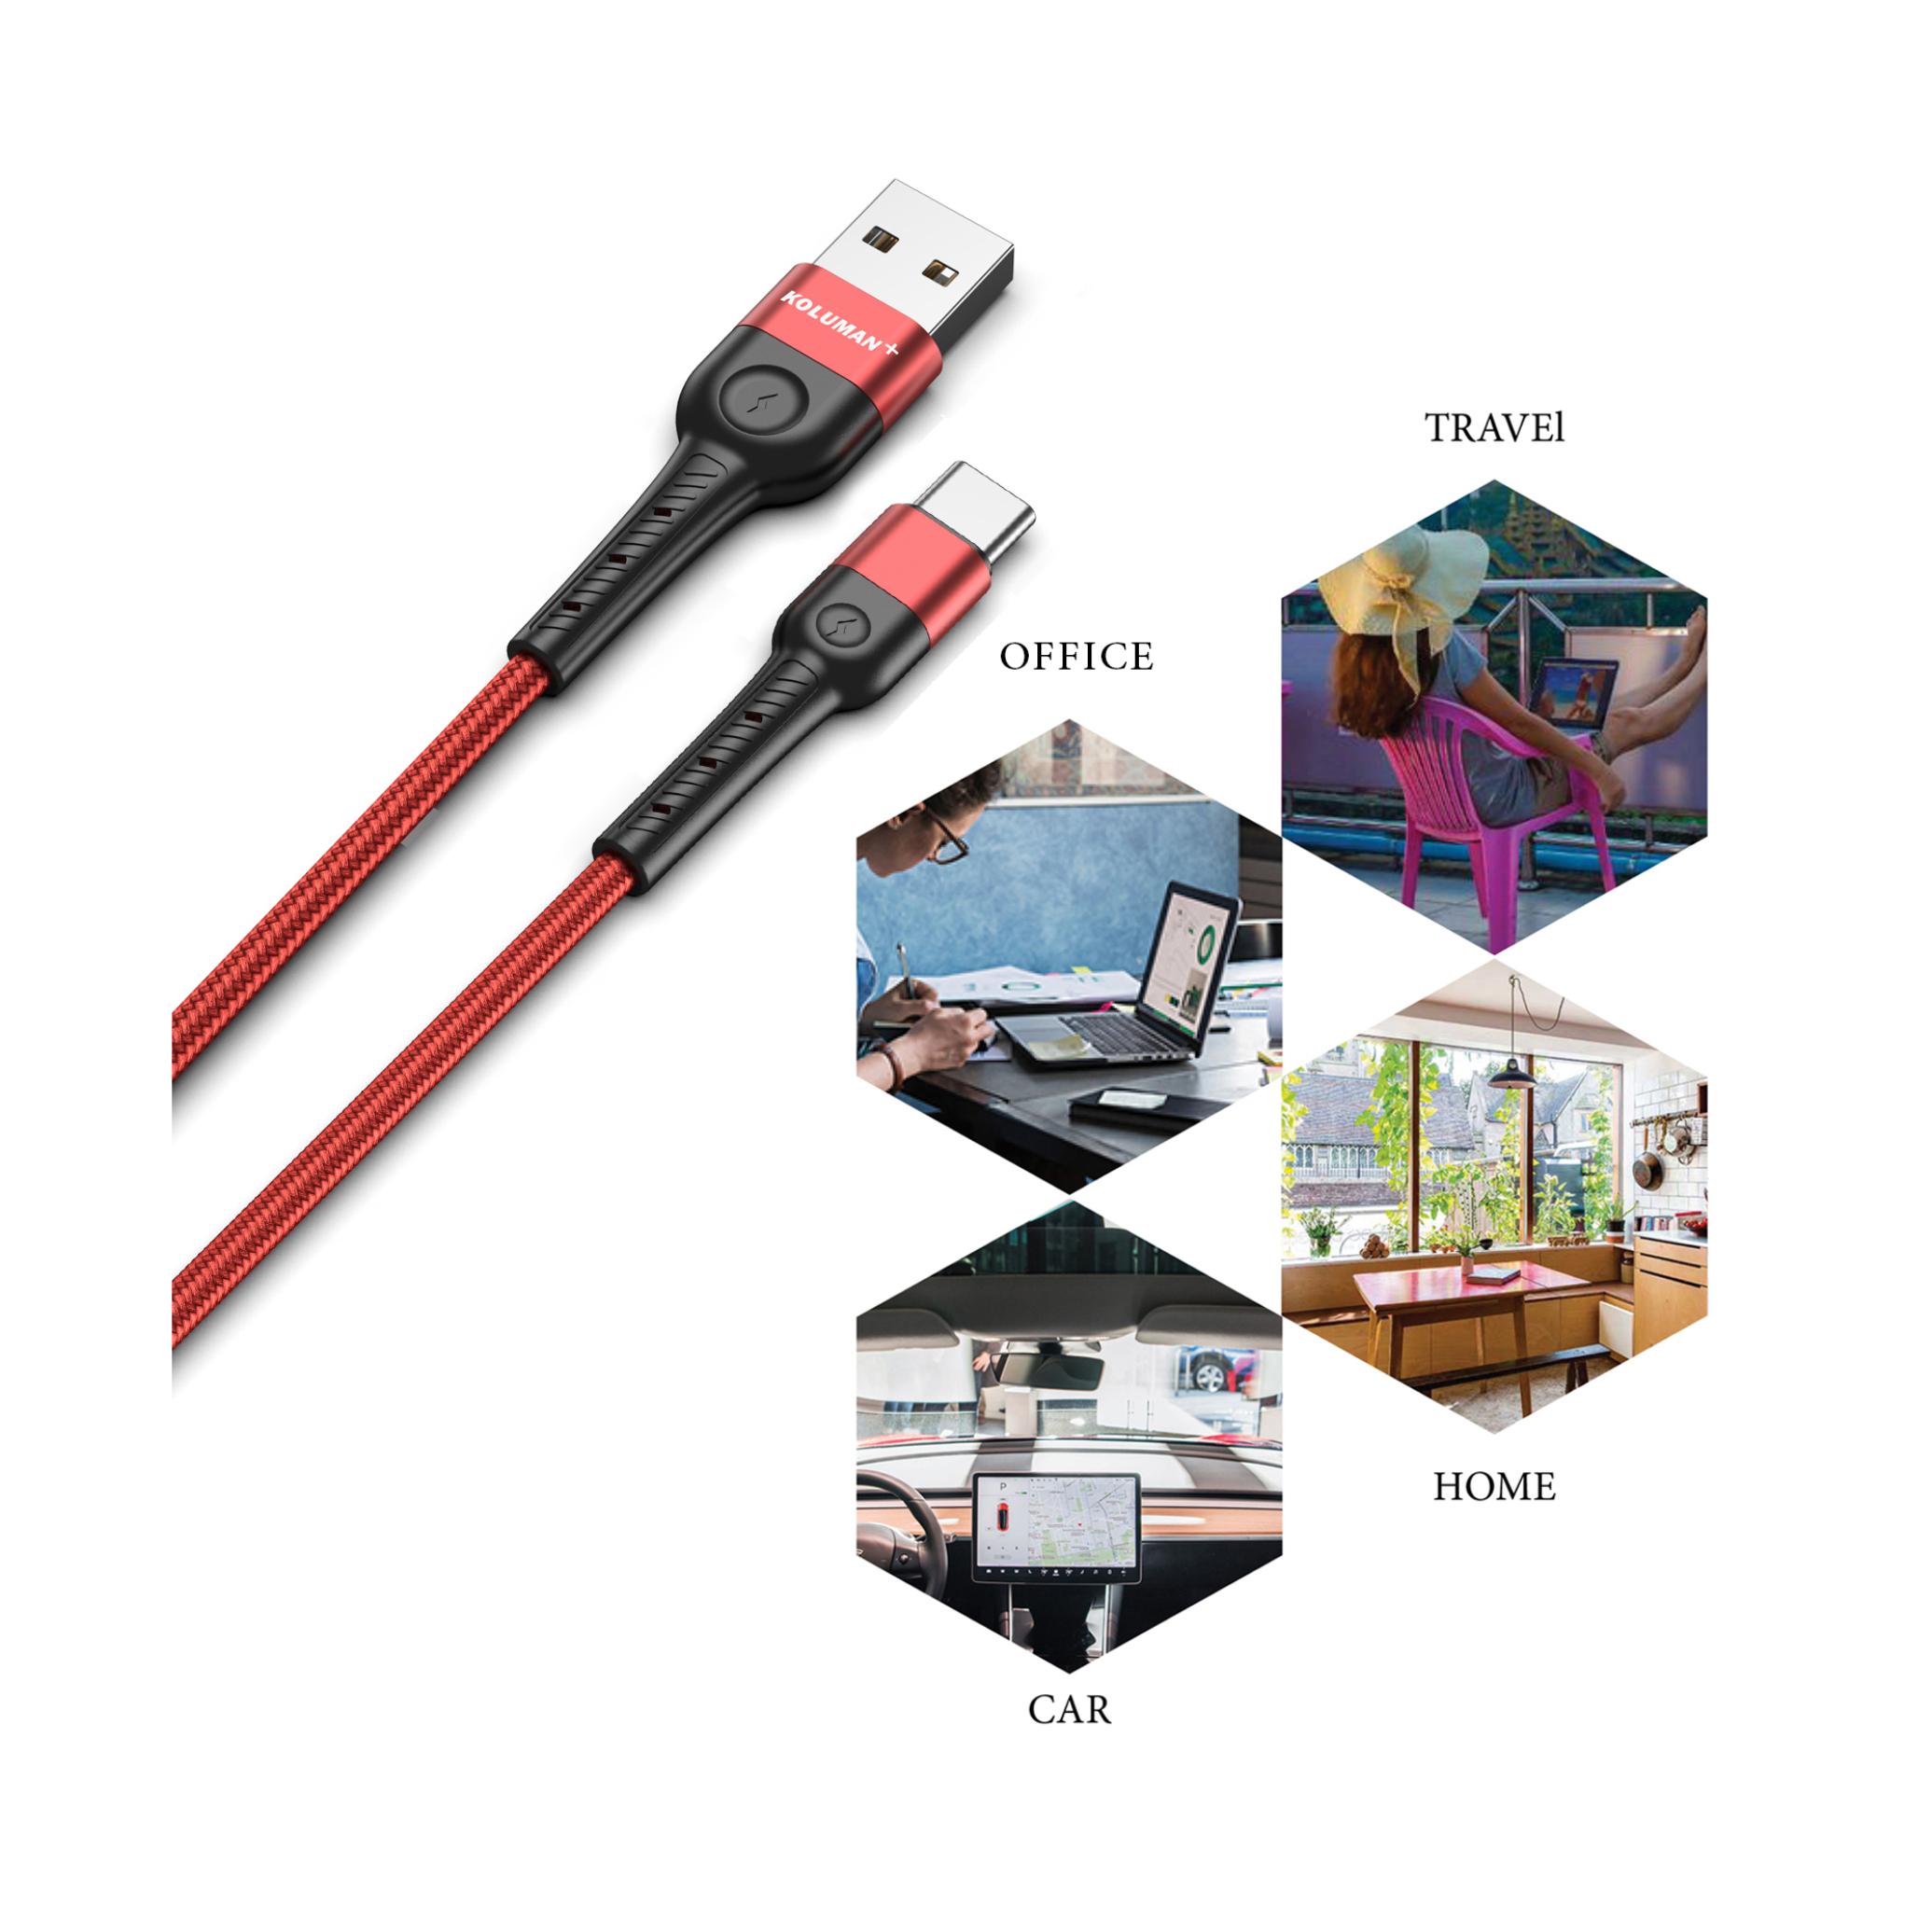 کابل تبدیل USB به USB-C کلومن پلاس مدل K7+